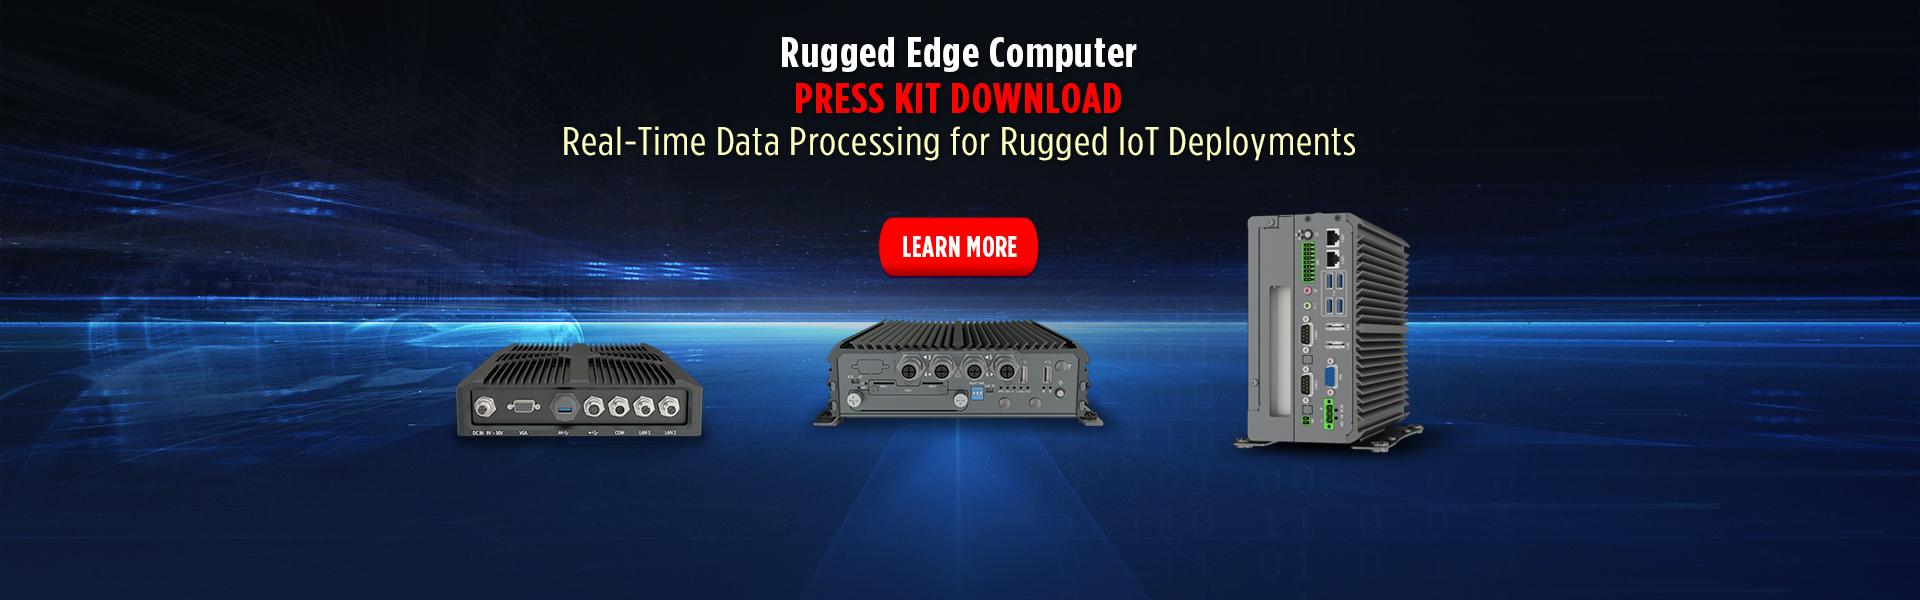 Rugged Edge Computer Press Kit Download